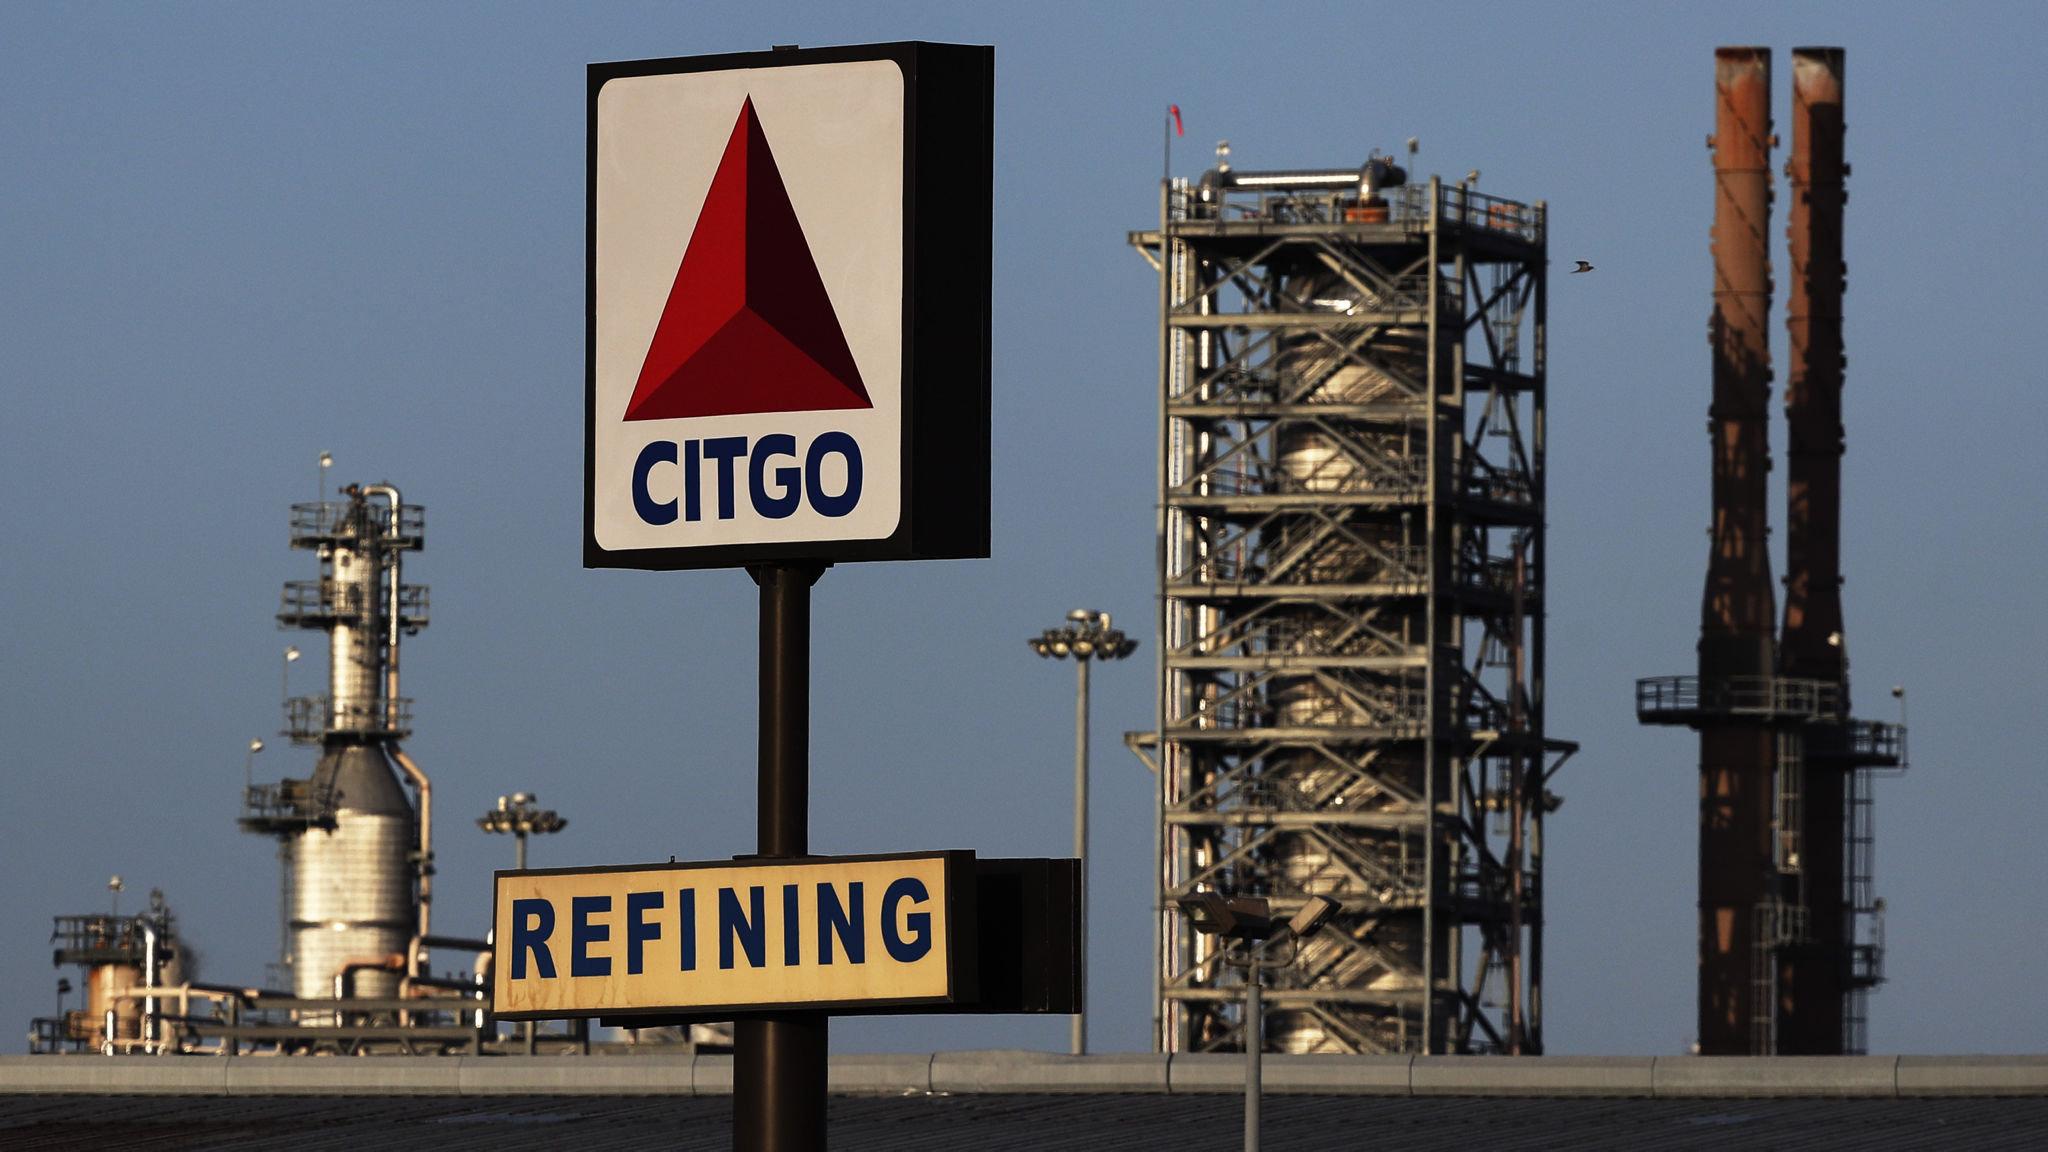 Creditors and politicians spar over Venezuela's oil industry jewel Citgo